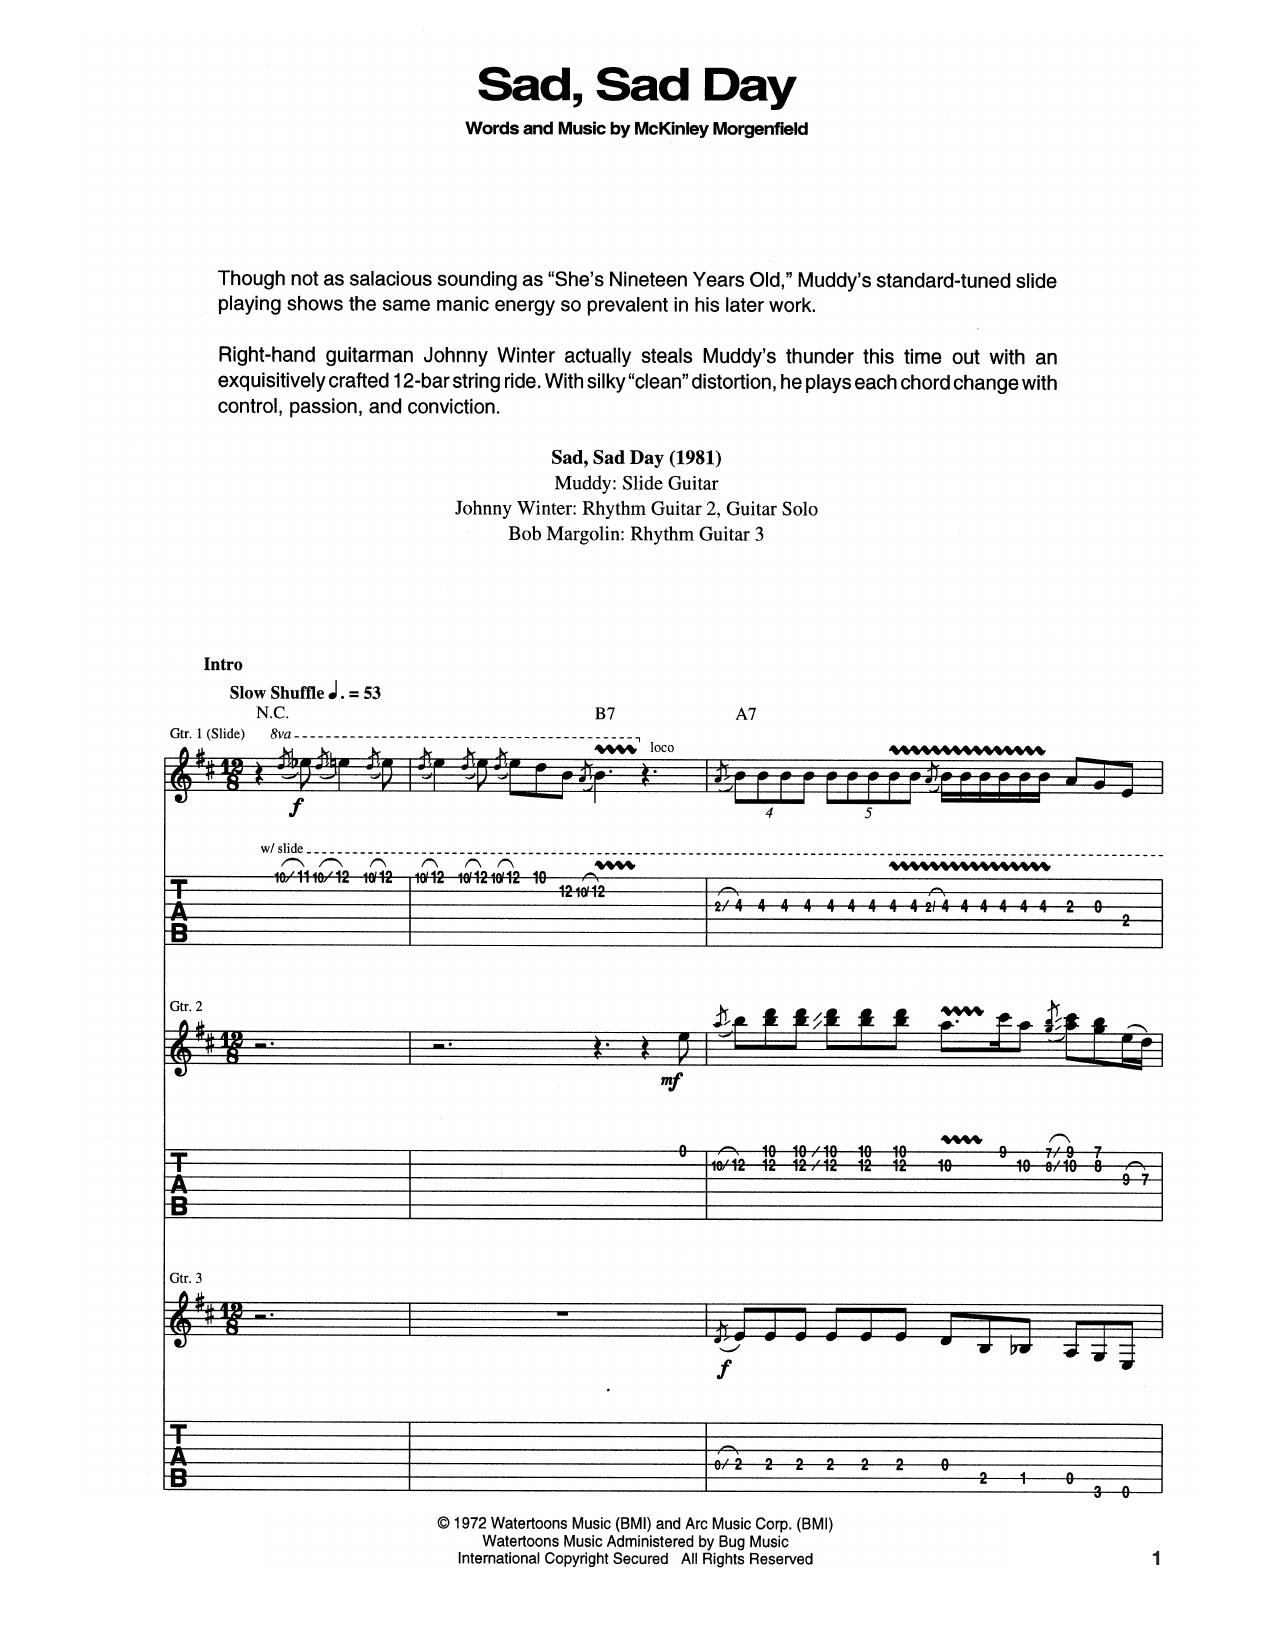 Sad, Sad Day Sheet Music